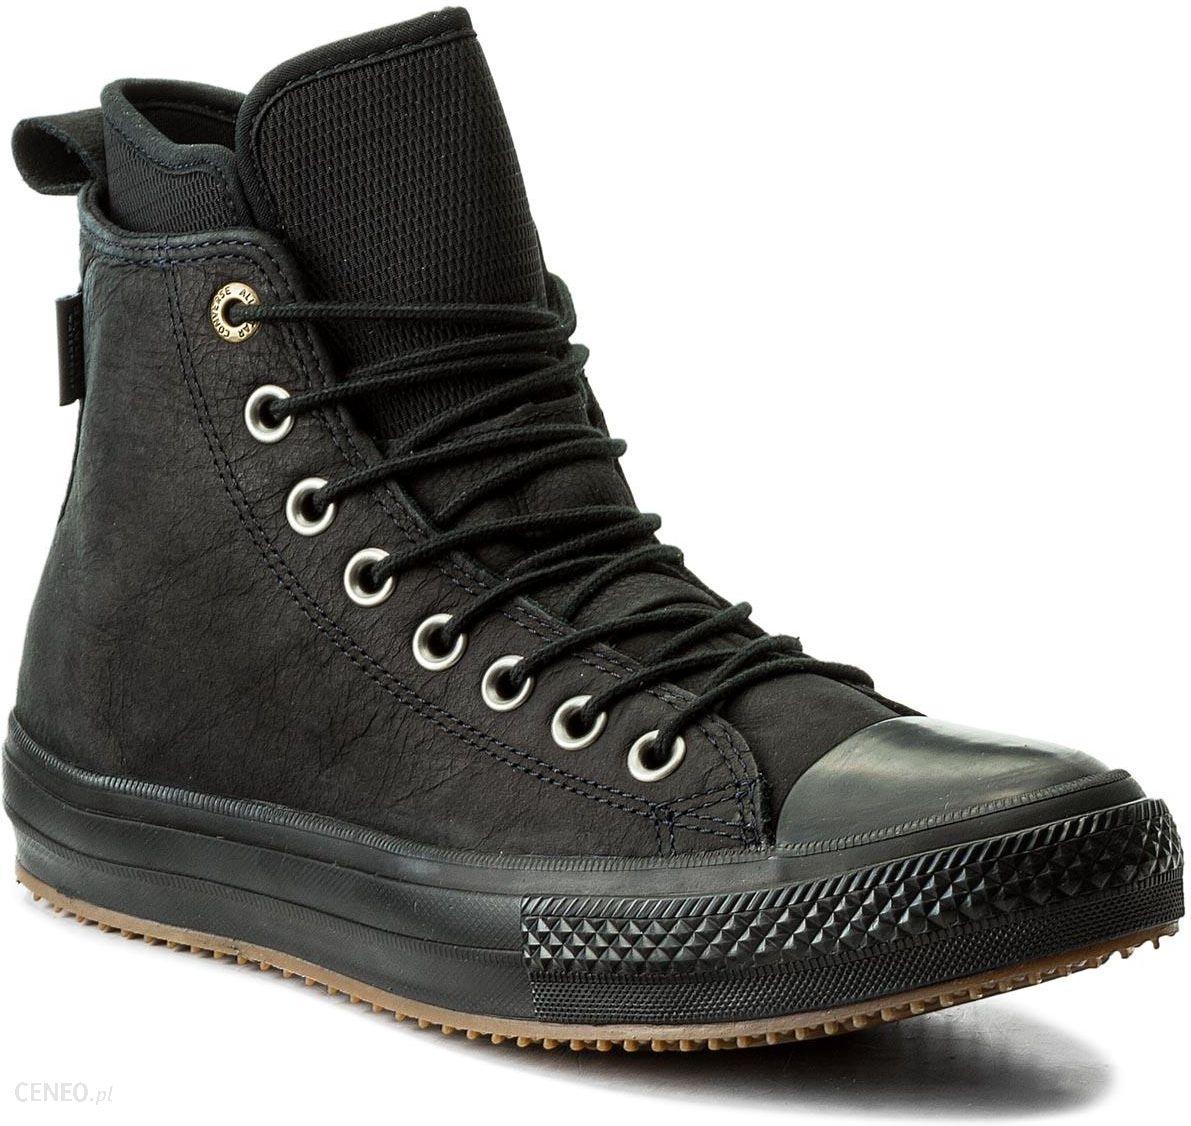 Trampki CONVERSE Ctas Wp Boot Hi 157460C BlackBlackGum Ceny i opinie Ceneo.pl